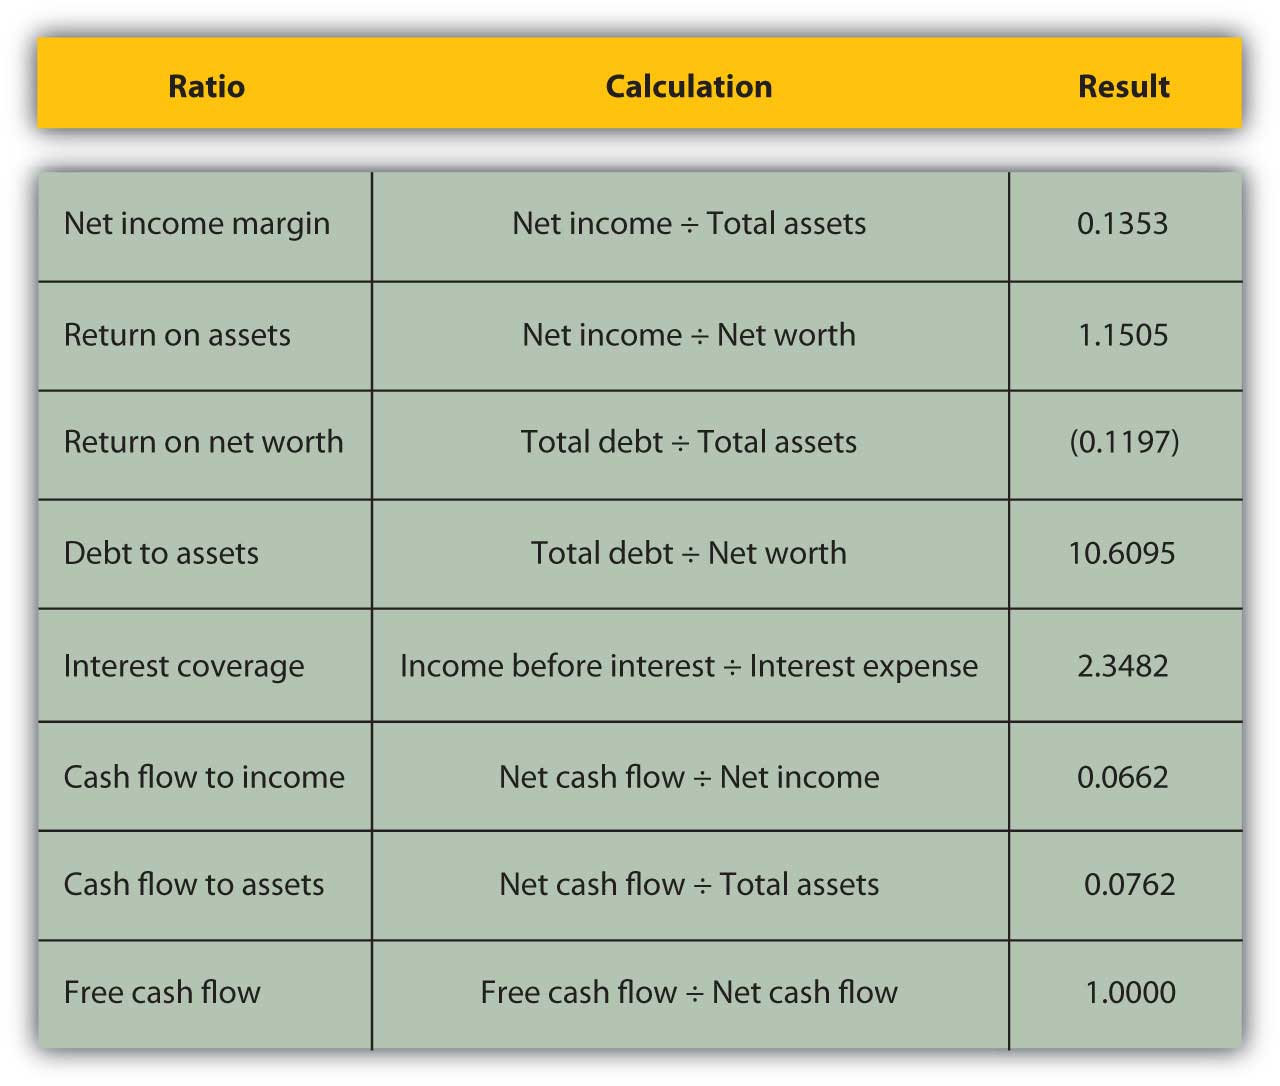 Personal Finance v1.0.1 | FlatWorld